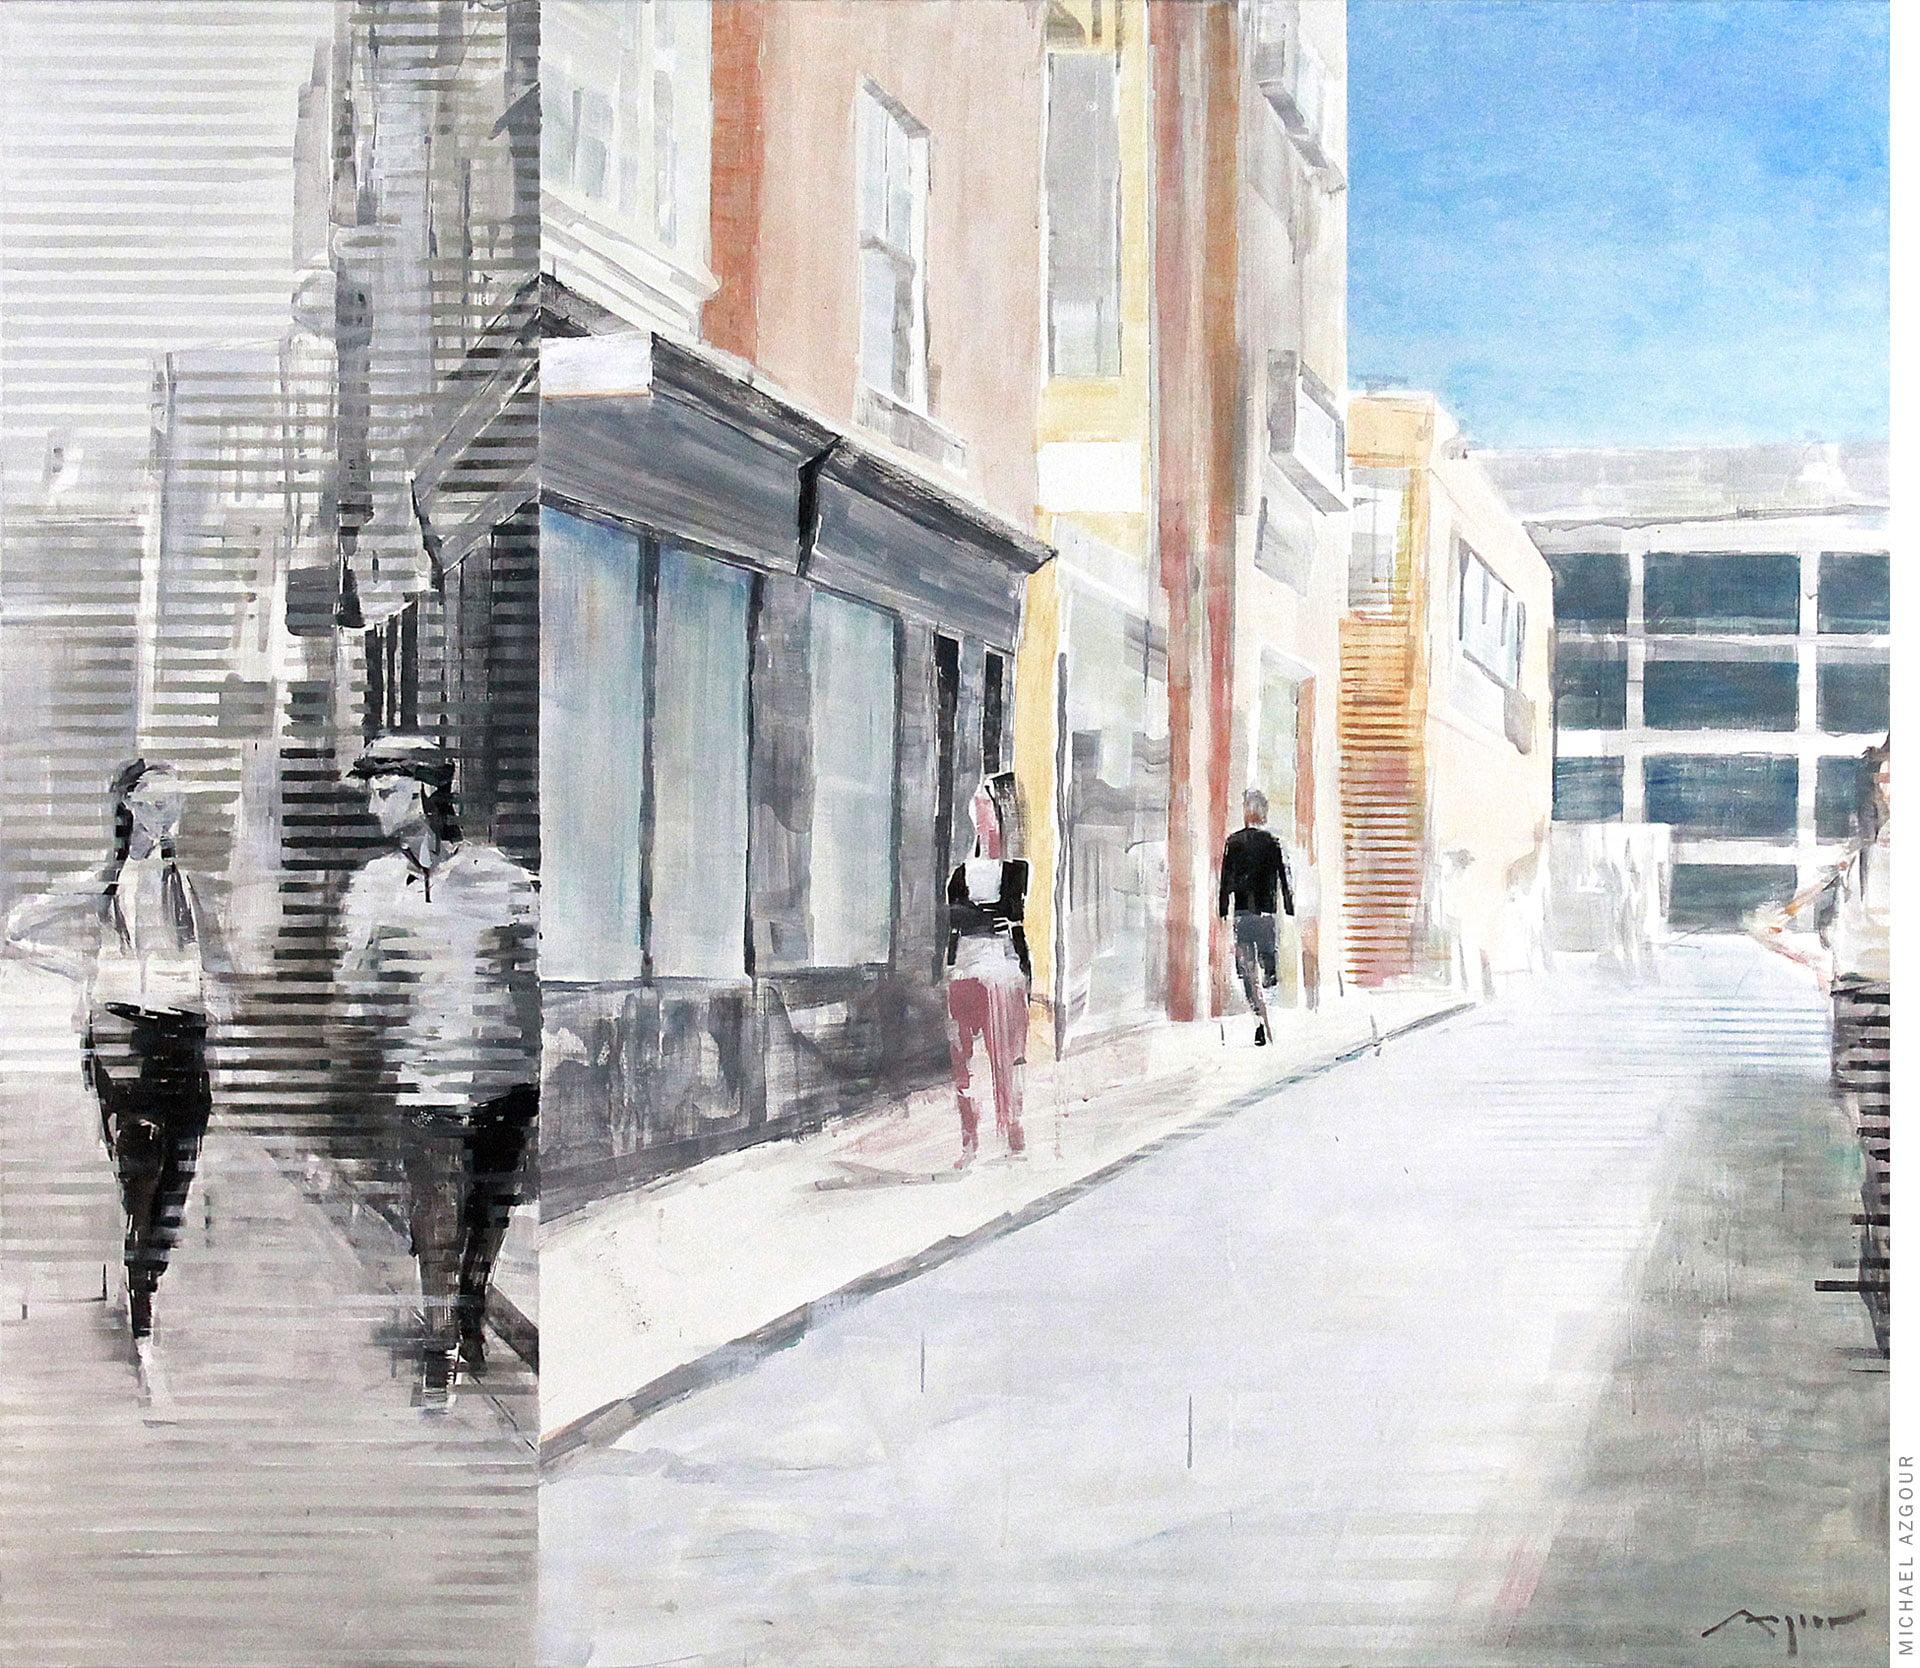 London 4: Street View